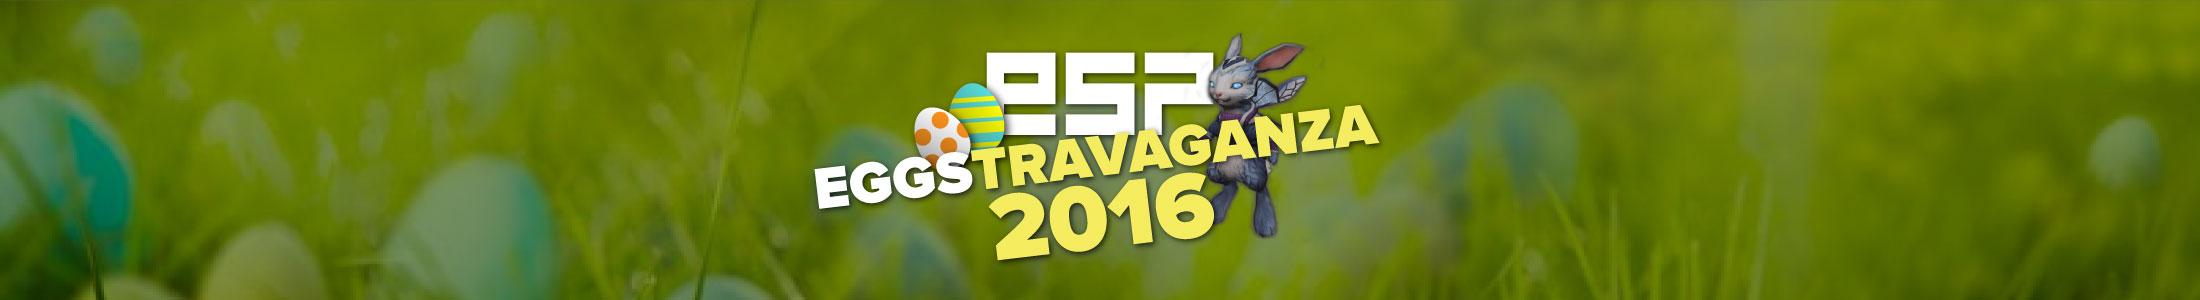 eggstravaganza2016_header